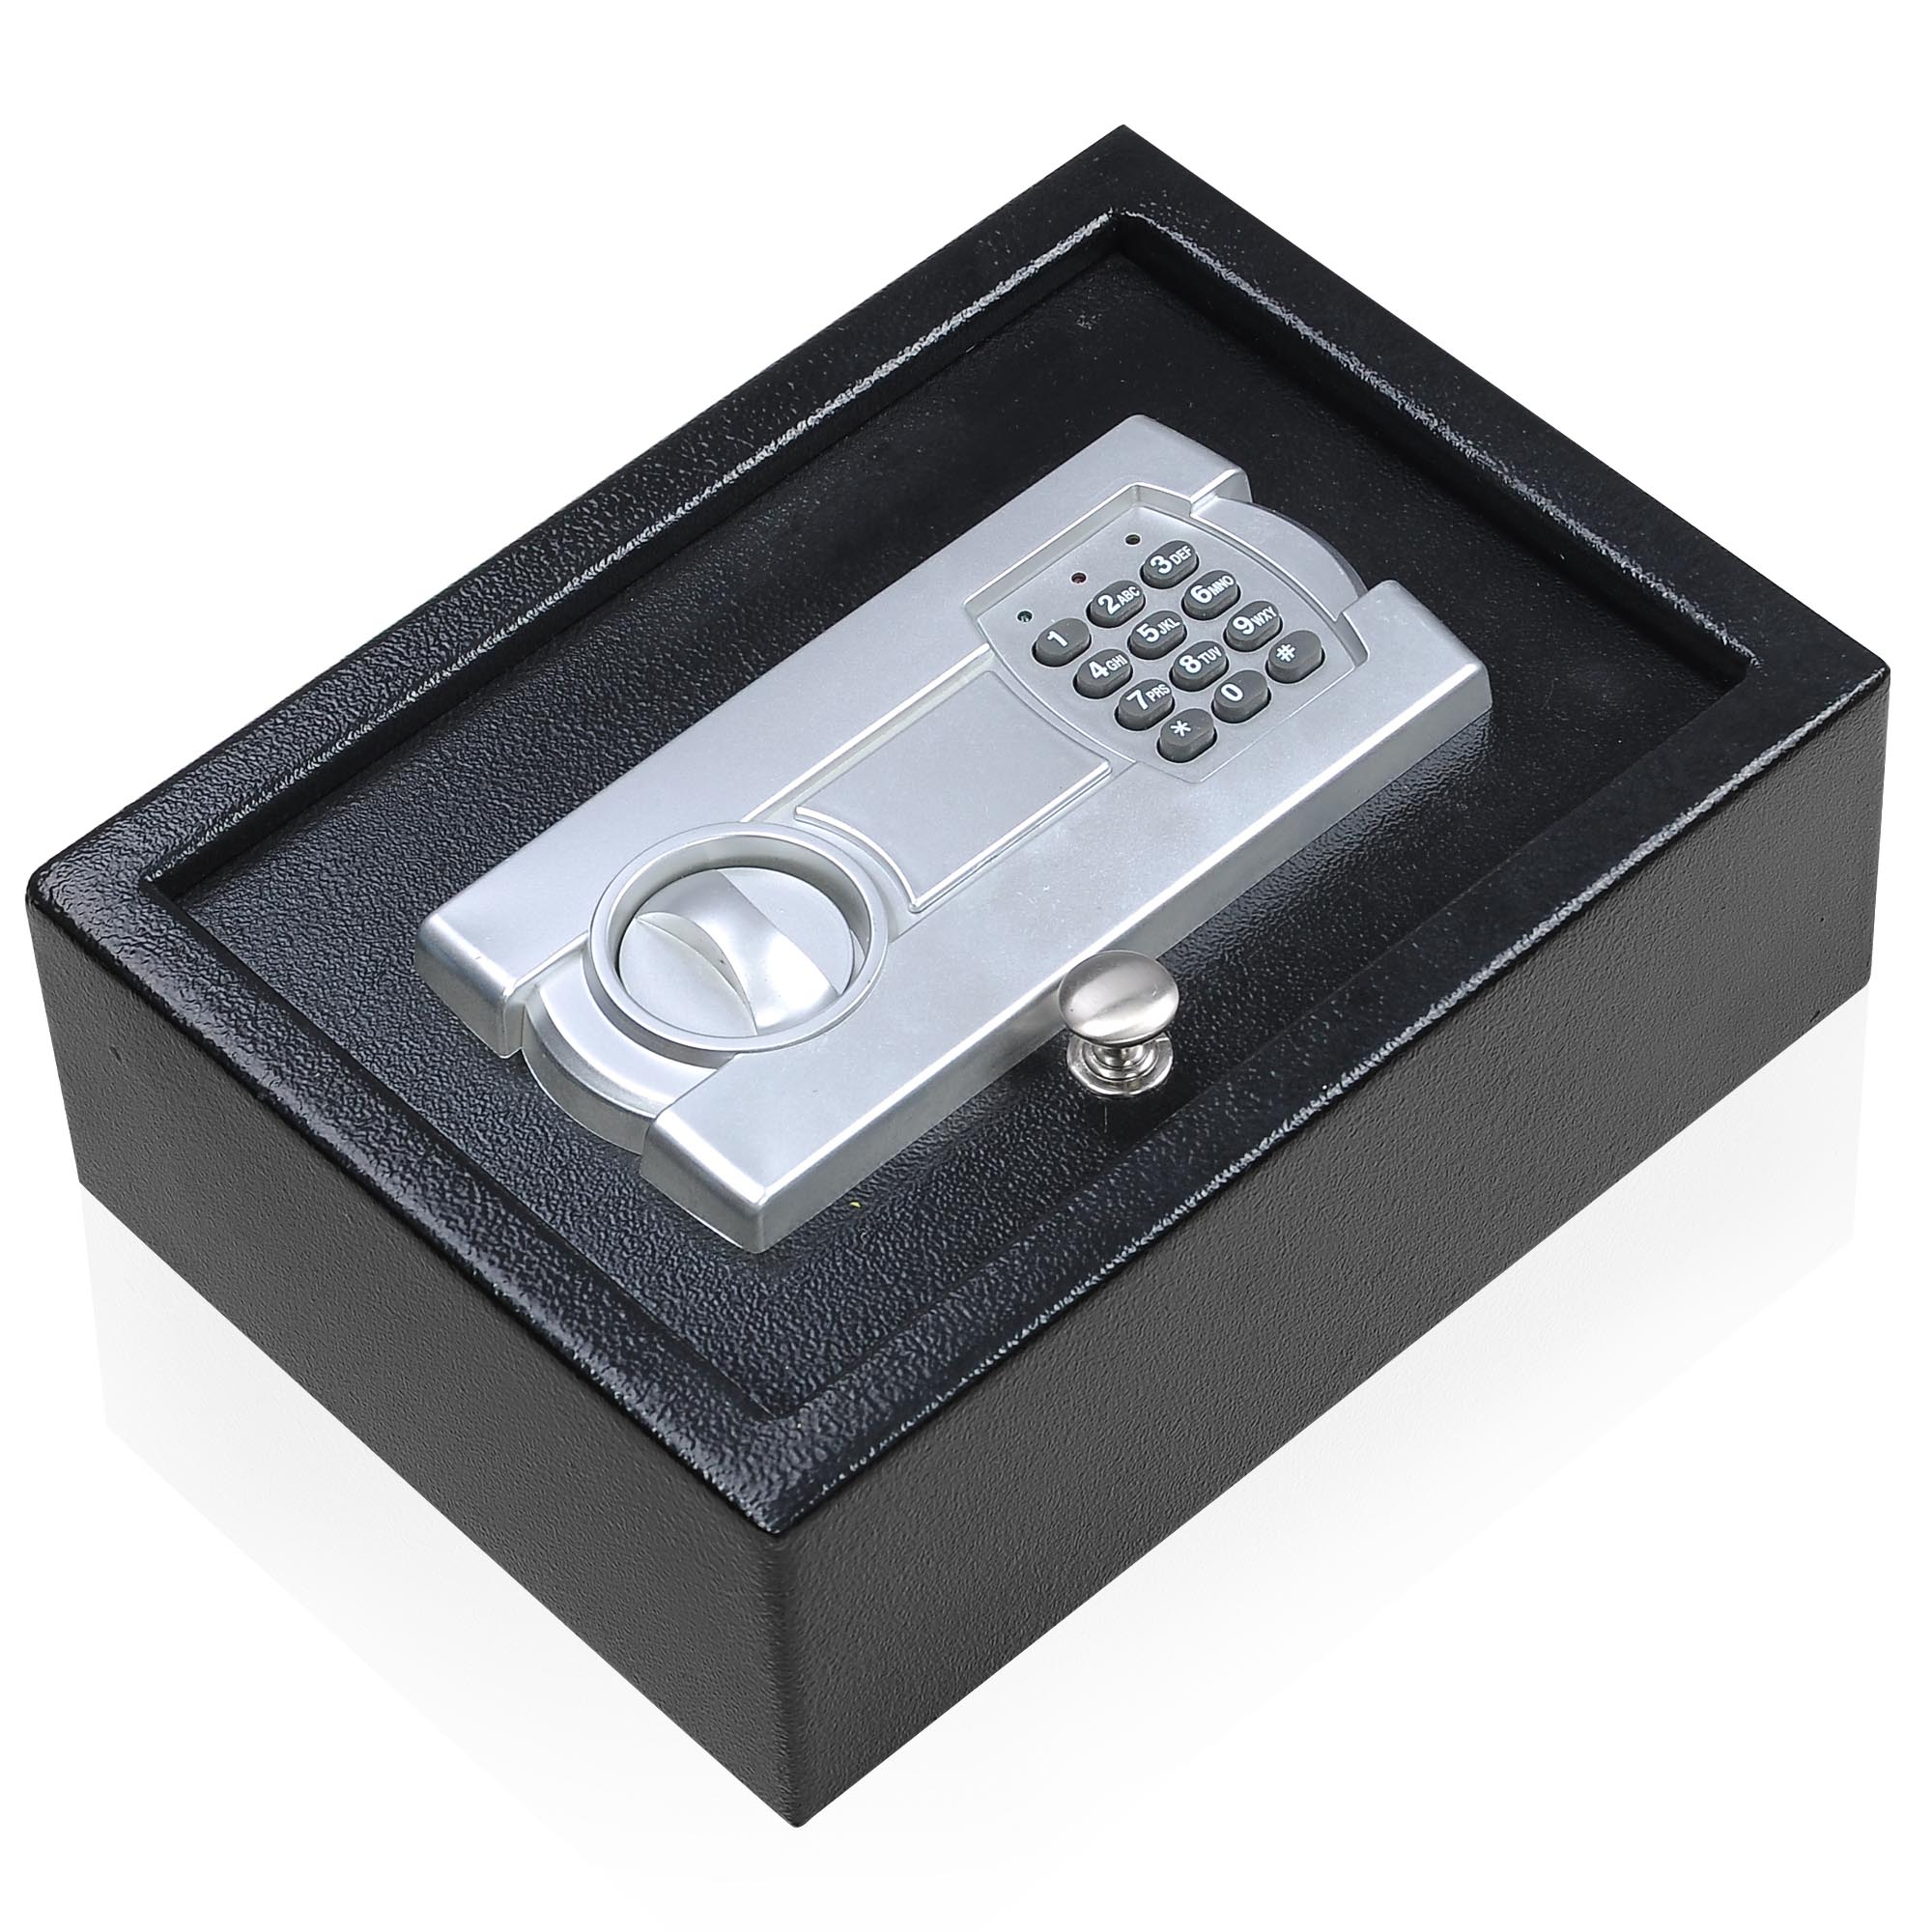 Portable 12X9 Keypad Safe Hand Gun Pistol Drawer Keyless Digital Electronic Lock Car RV Cash Box by Yescom